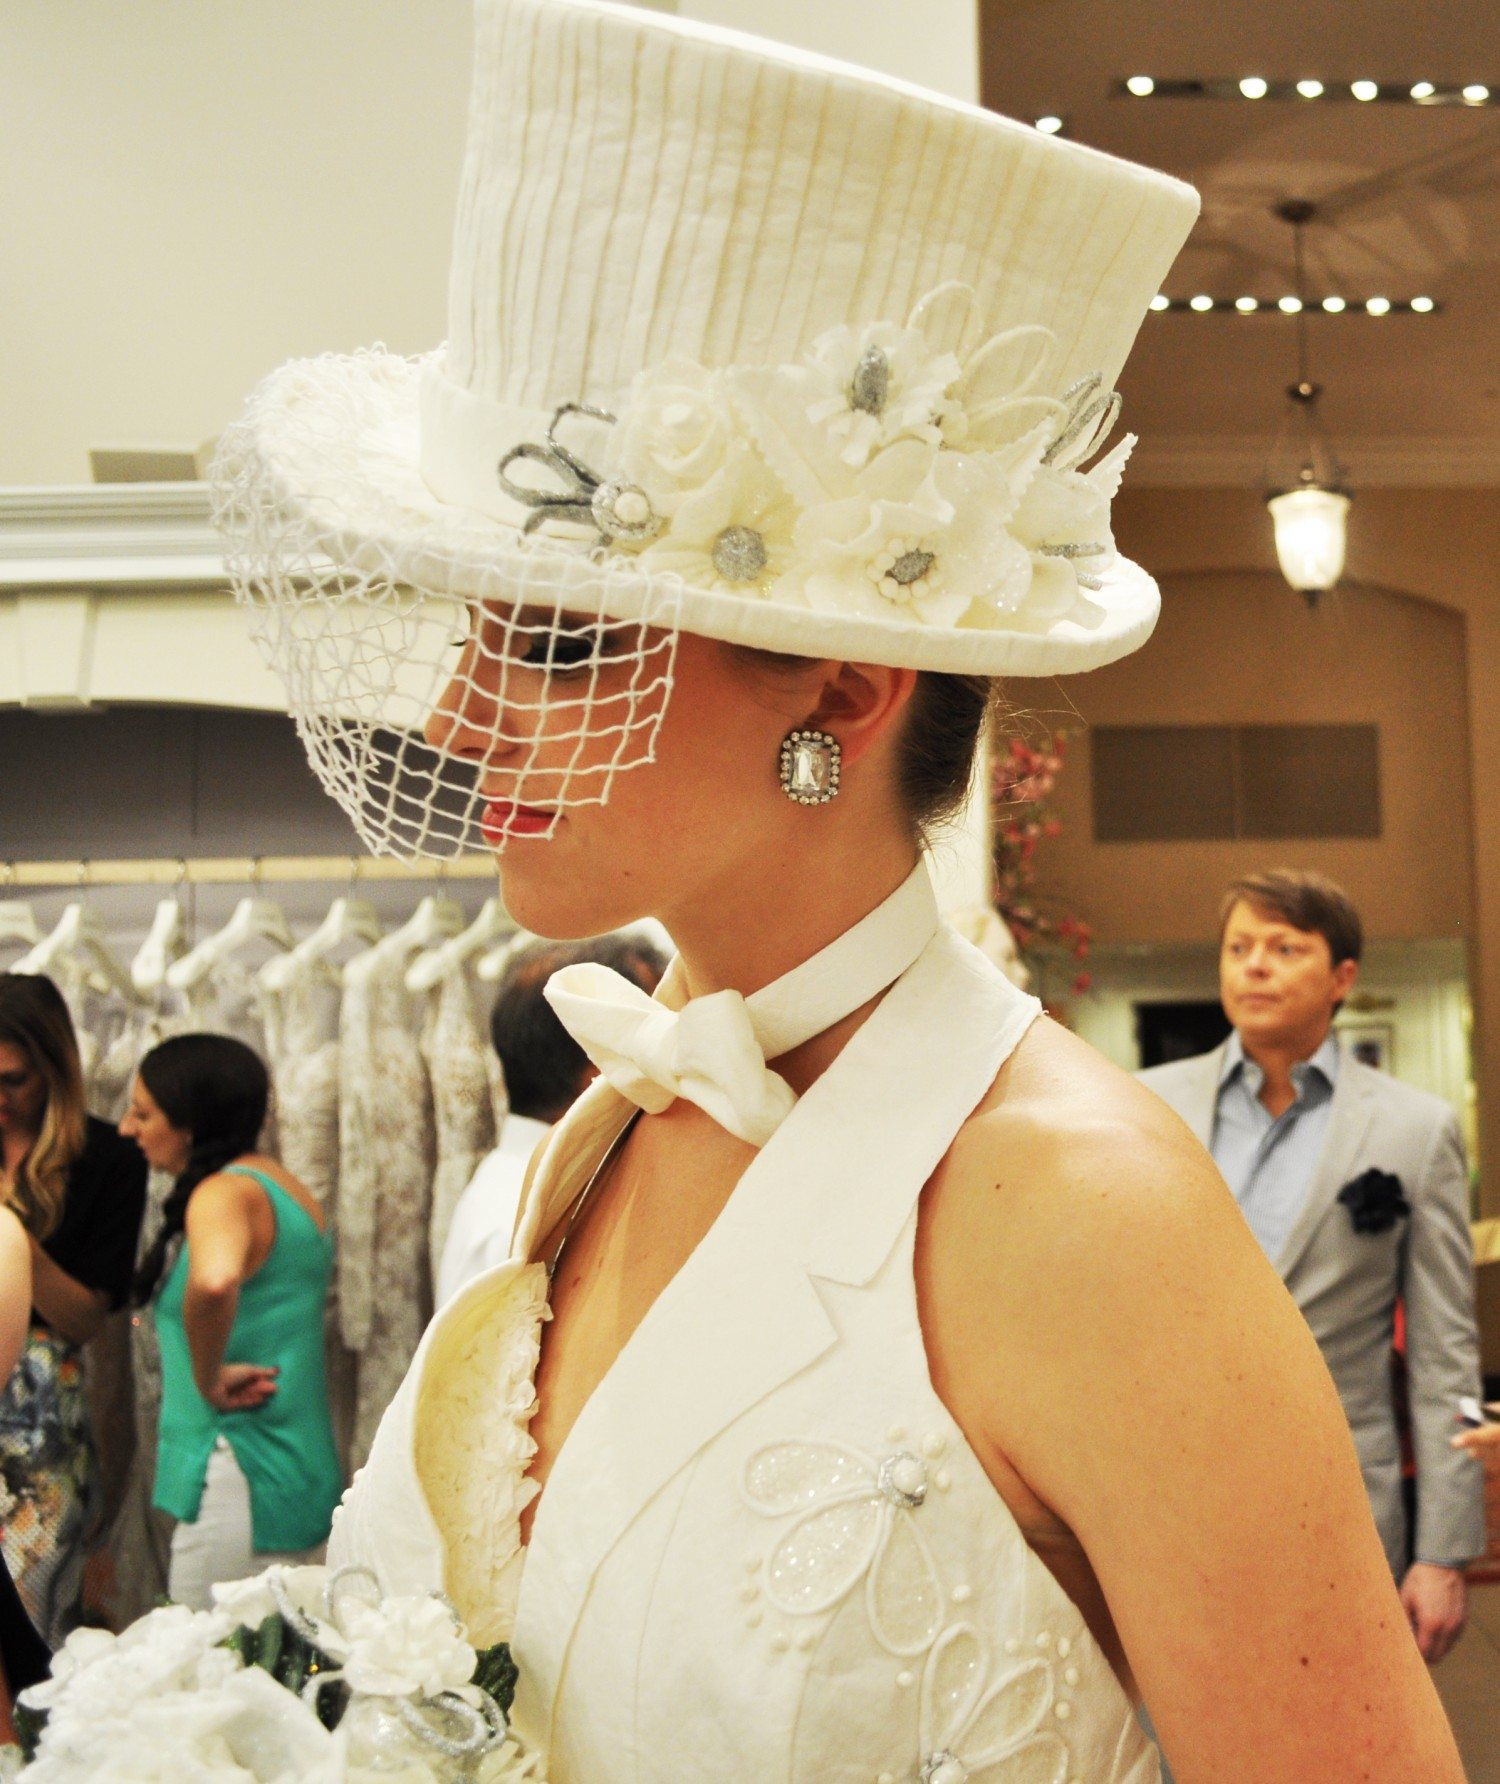 Cheap Chic Wedding Dress Winner Announced at Kleinfeld Bridal ... bee6f3de6cc